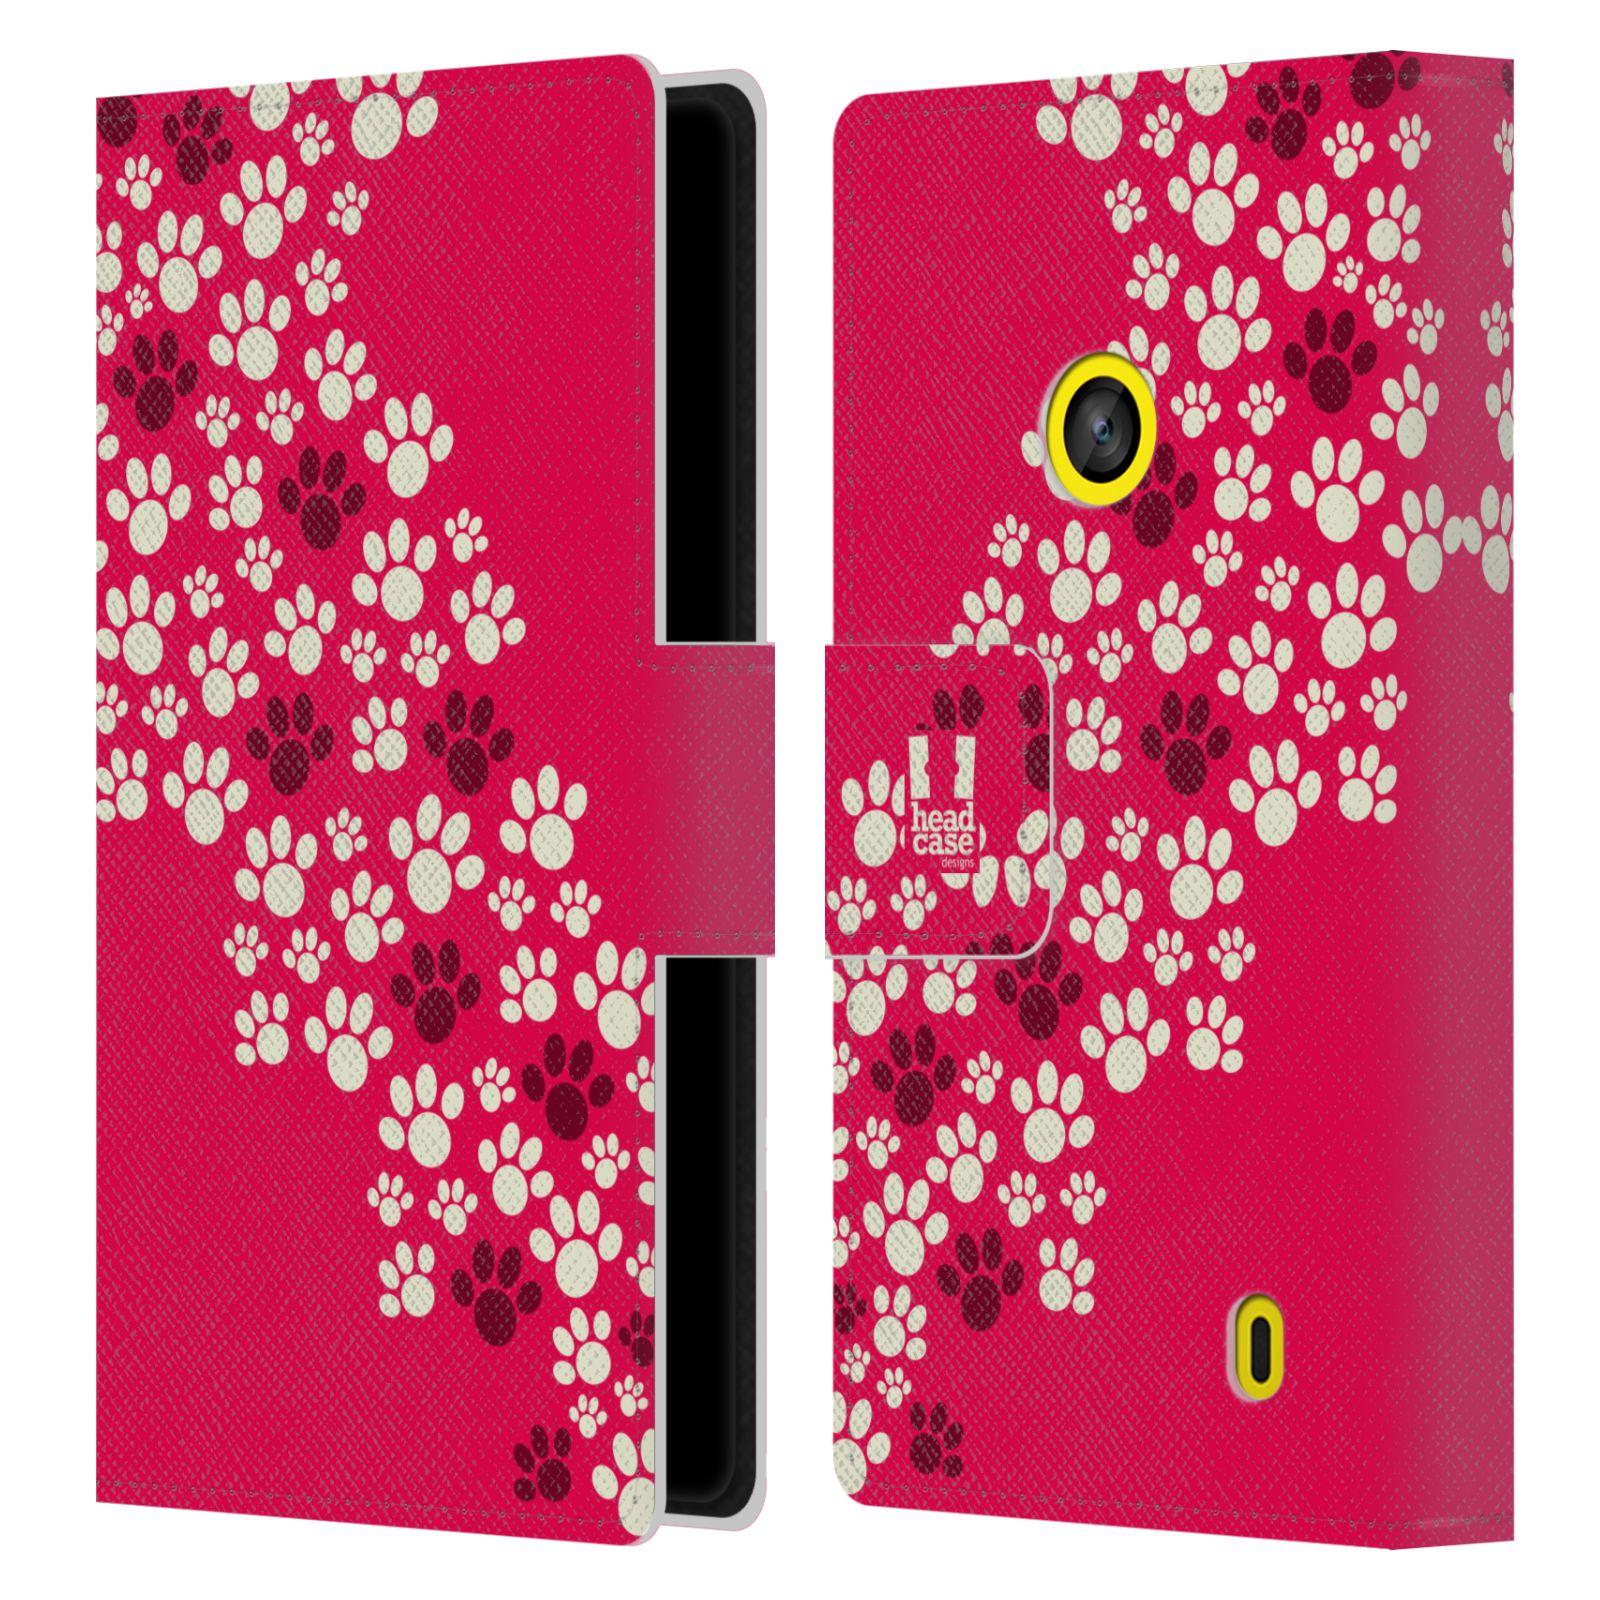 HEAD CASE Flipové pouzdro pro mobil NOKIA LUMIA 520 / 525 Pejsek ťapky růžová barva